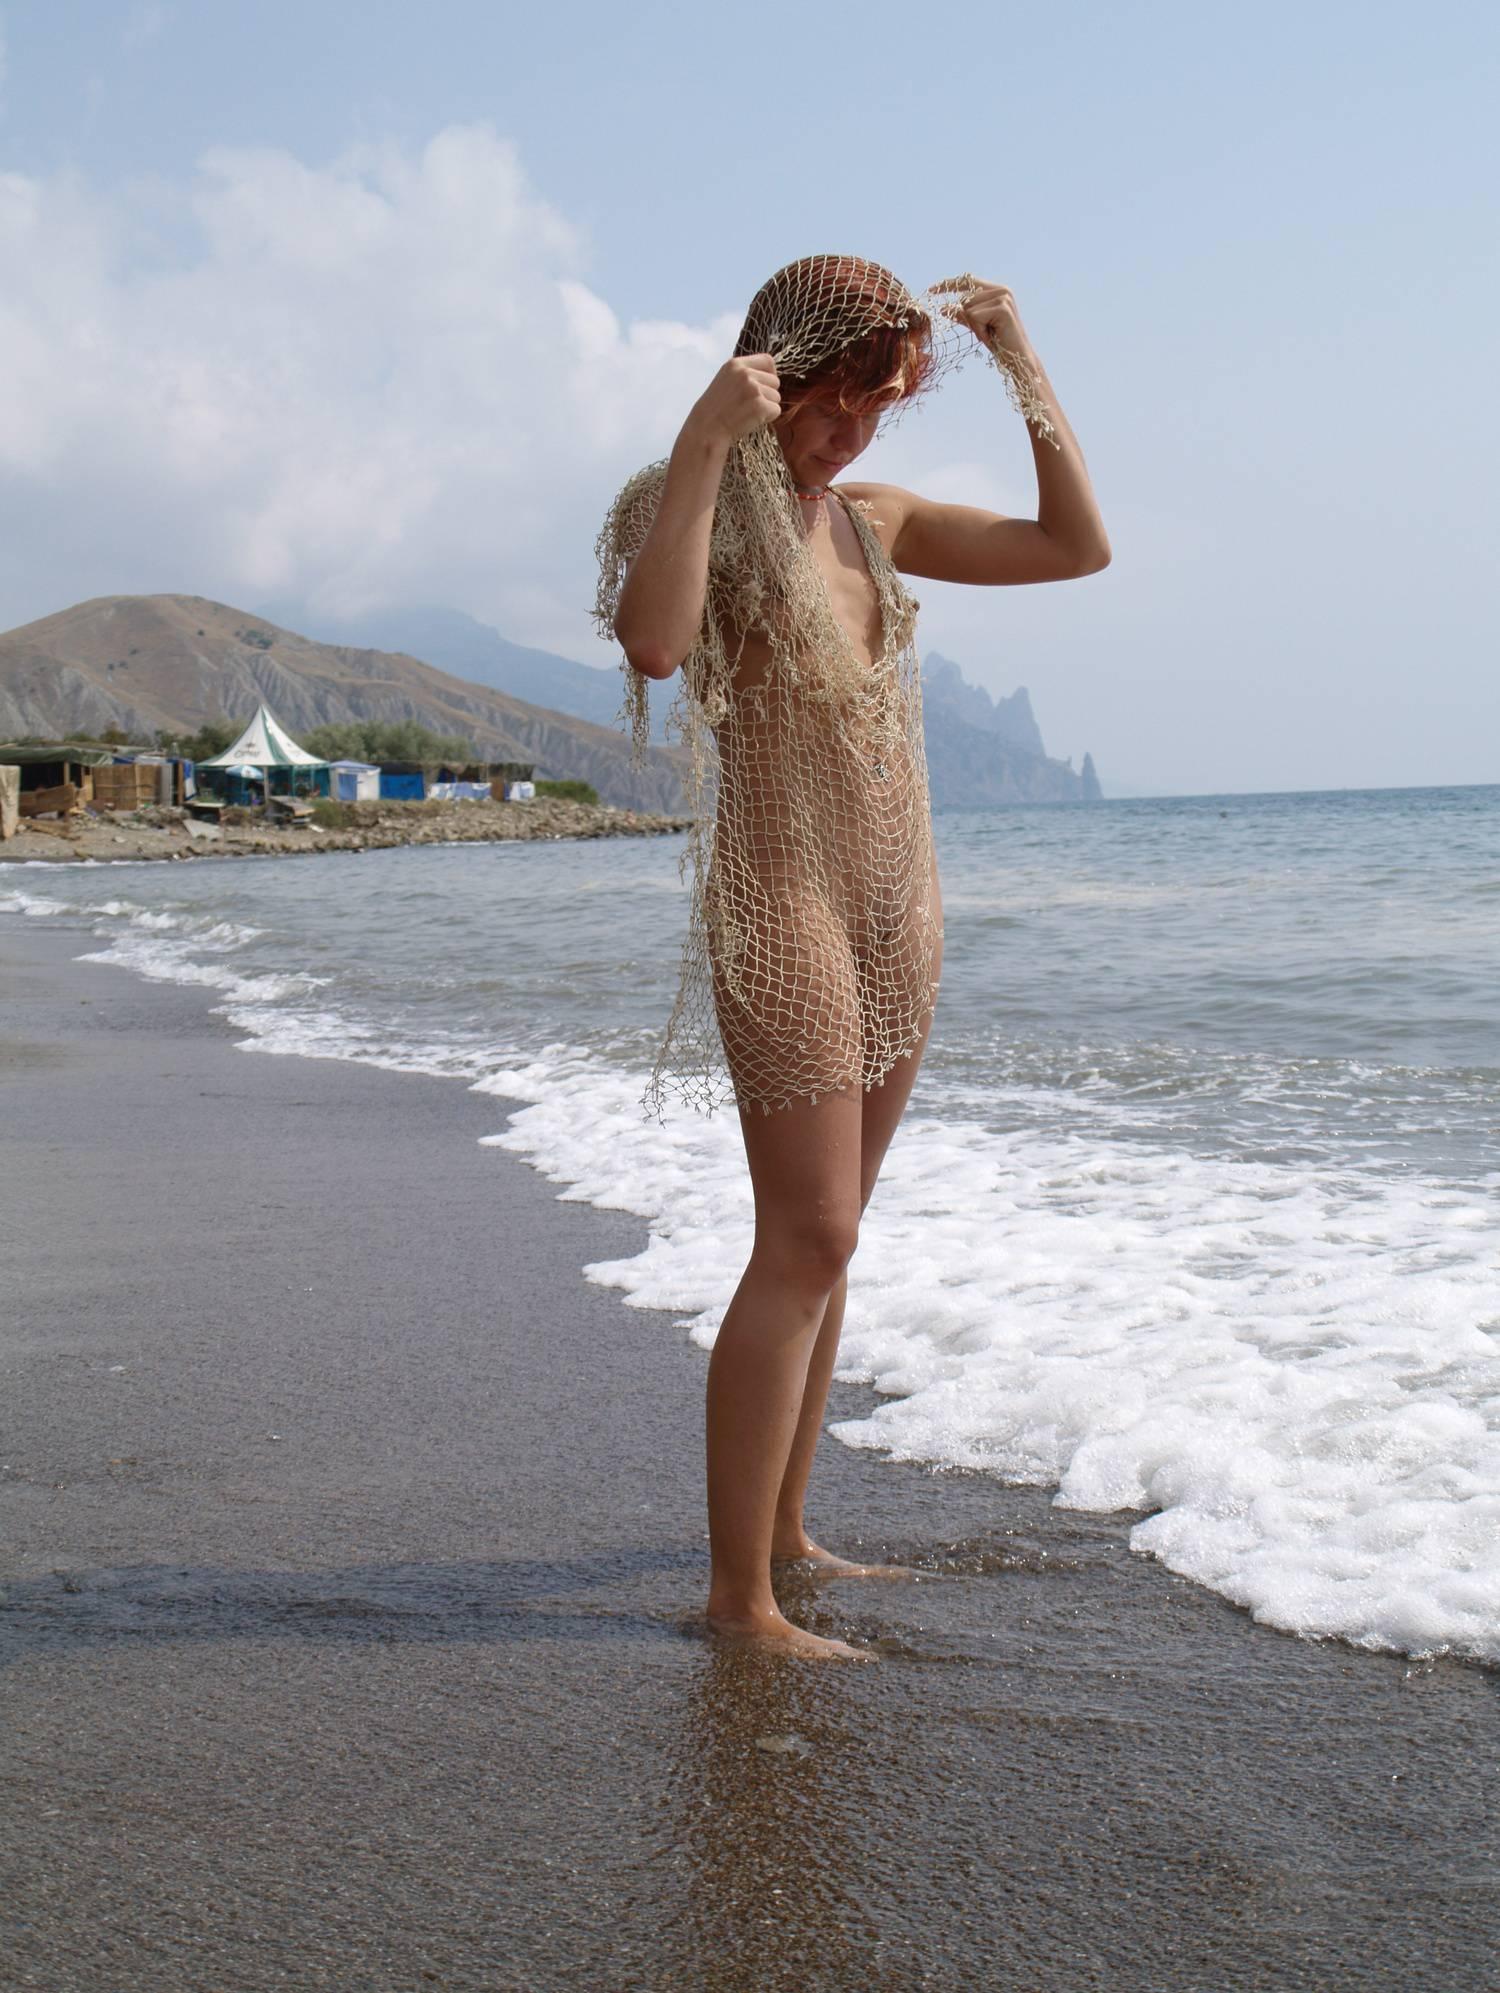 Nudist Girl Net and Sands - 2